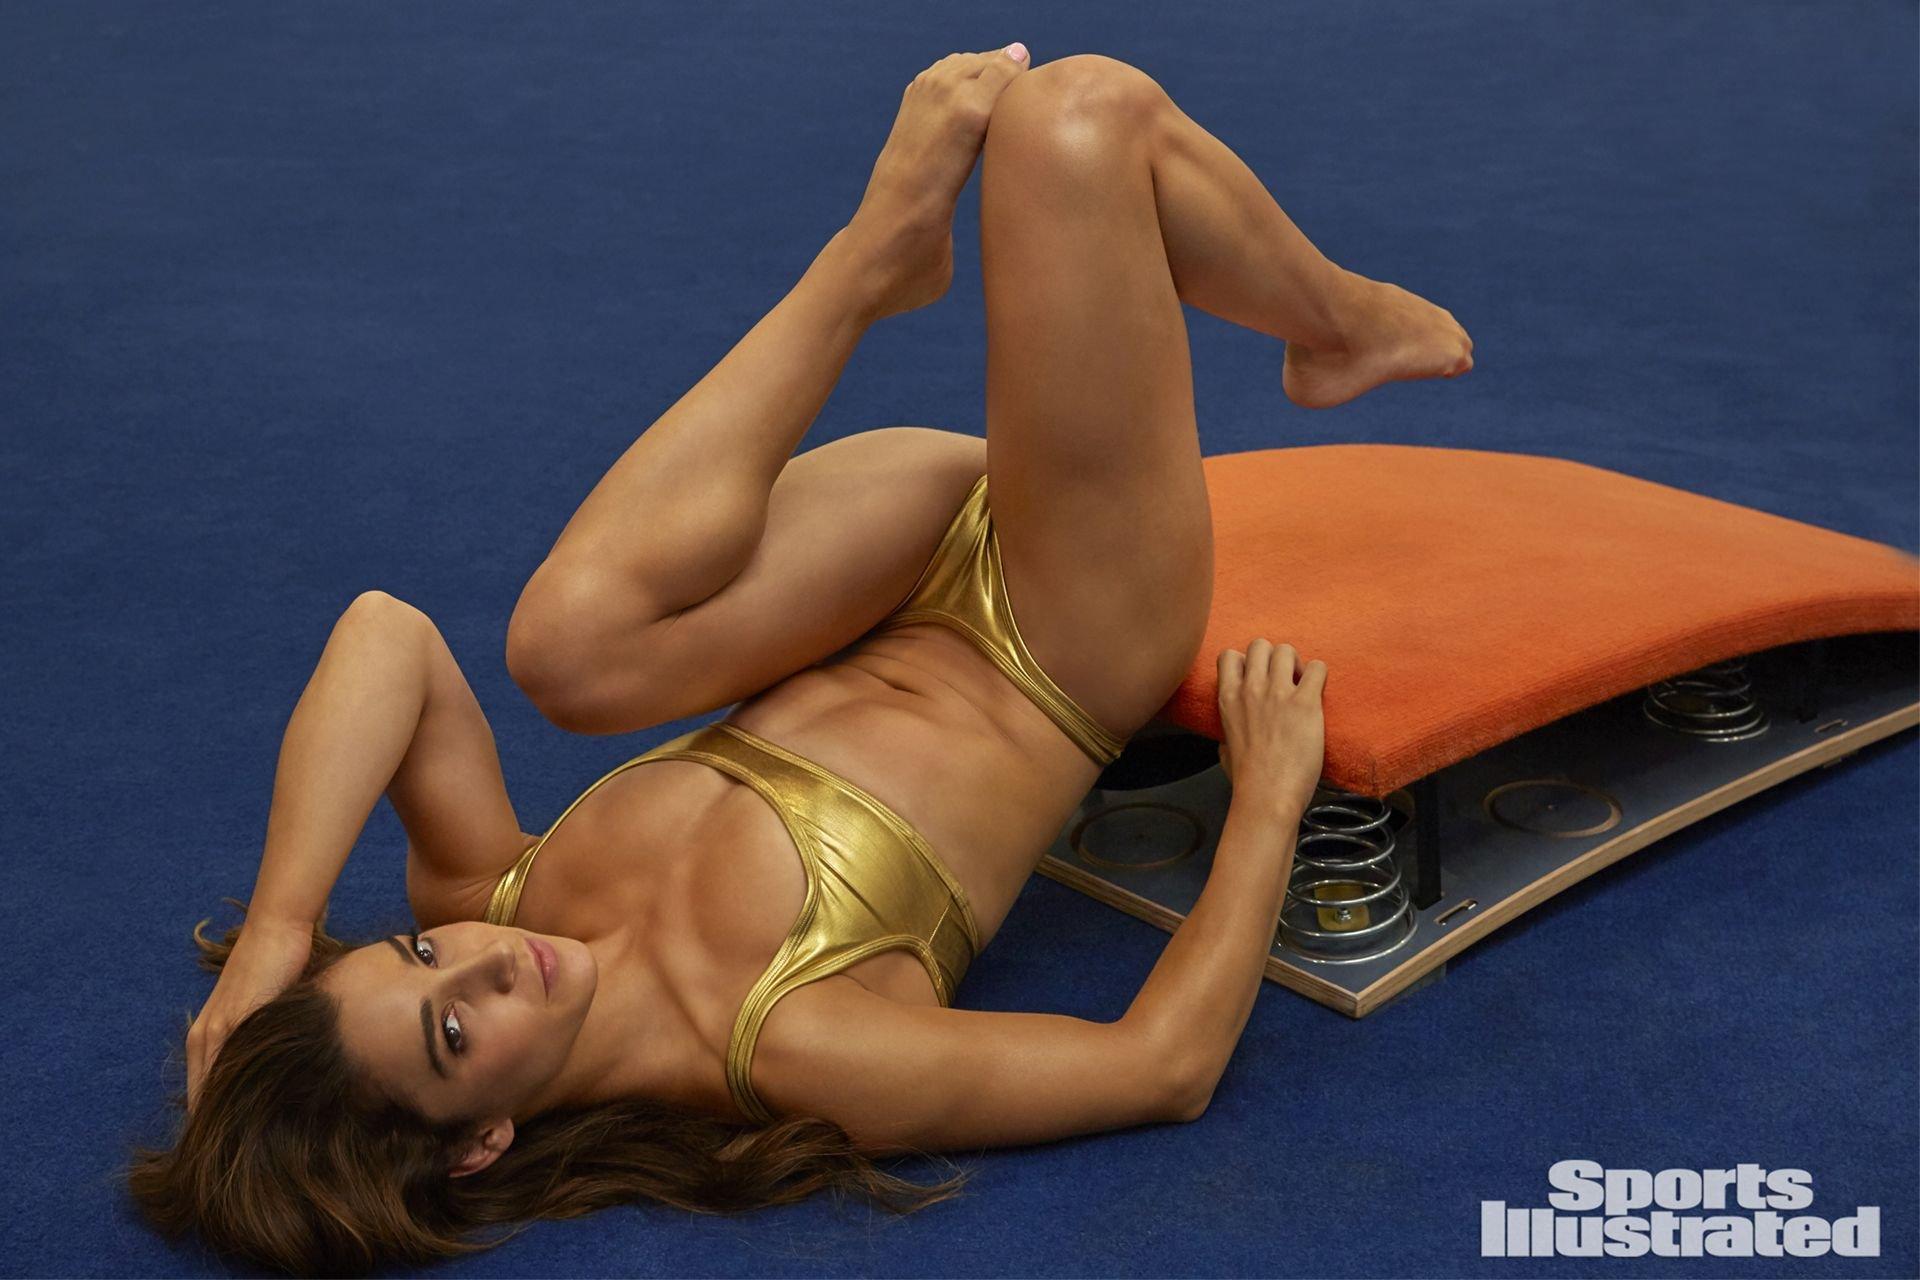 Yoga Beautiful Sexy Body Young Woman Stock Photo